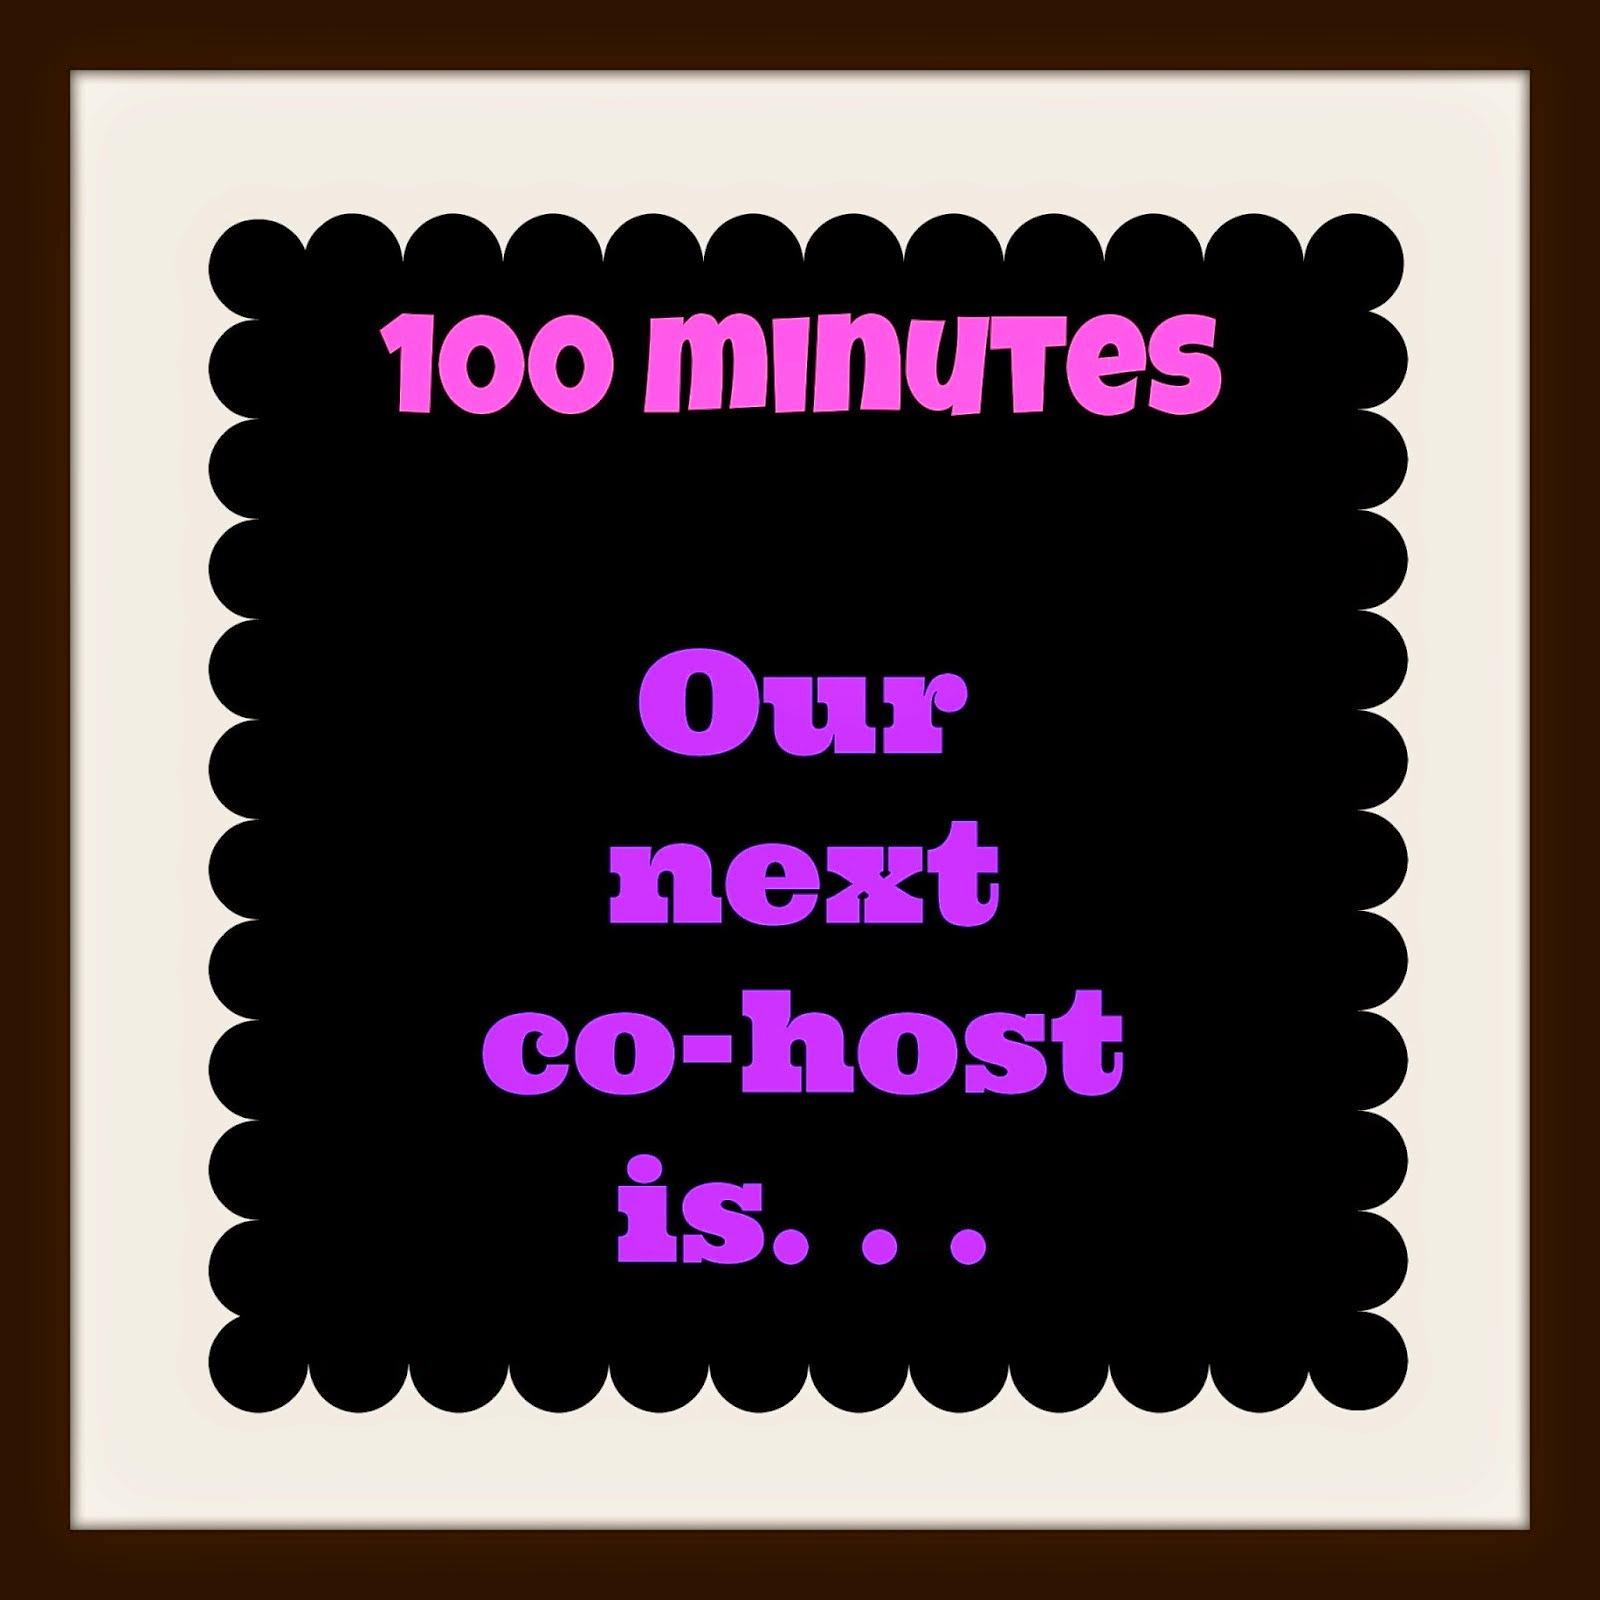 http://thinkingofteaching.blogspot.com.es/